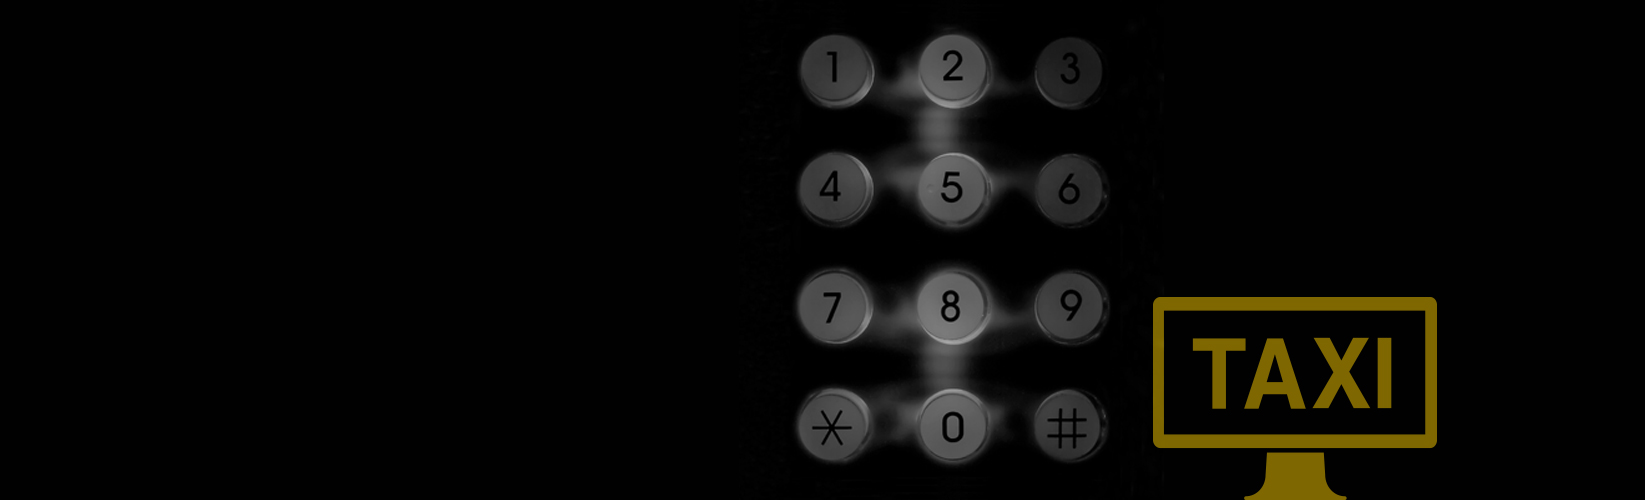 RADIO TAXI(无线电出租车) 拨打电话至:051 372727